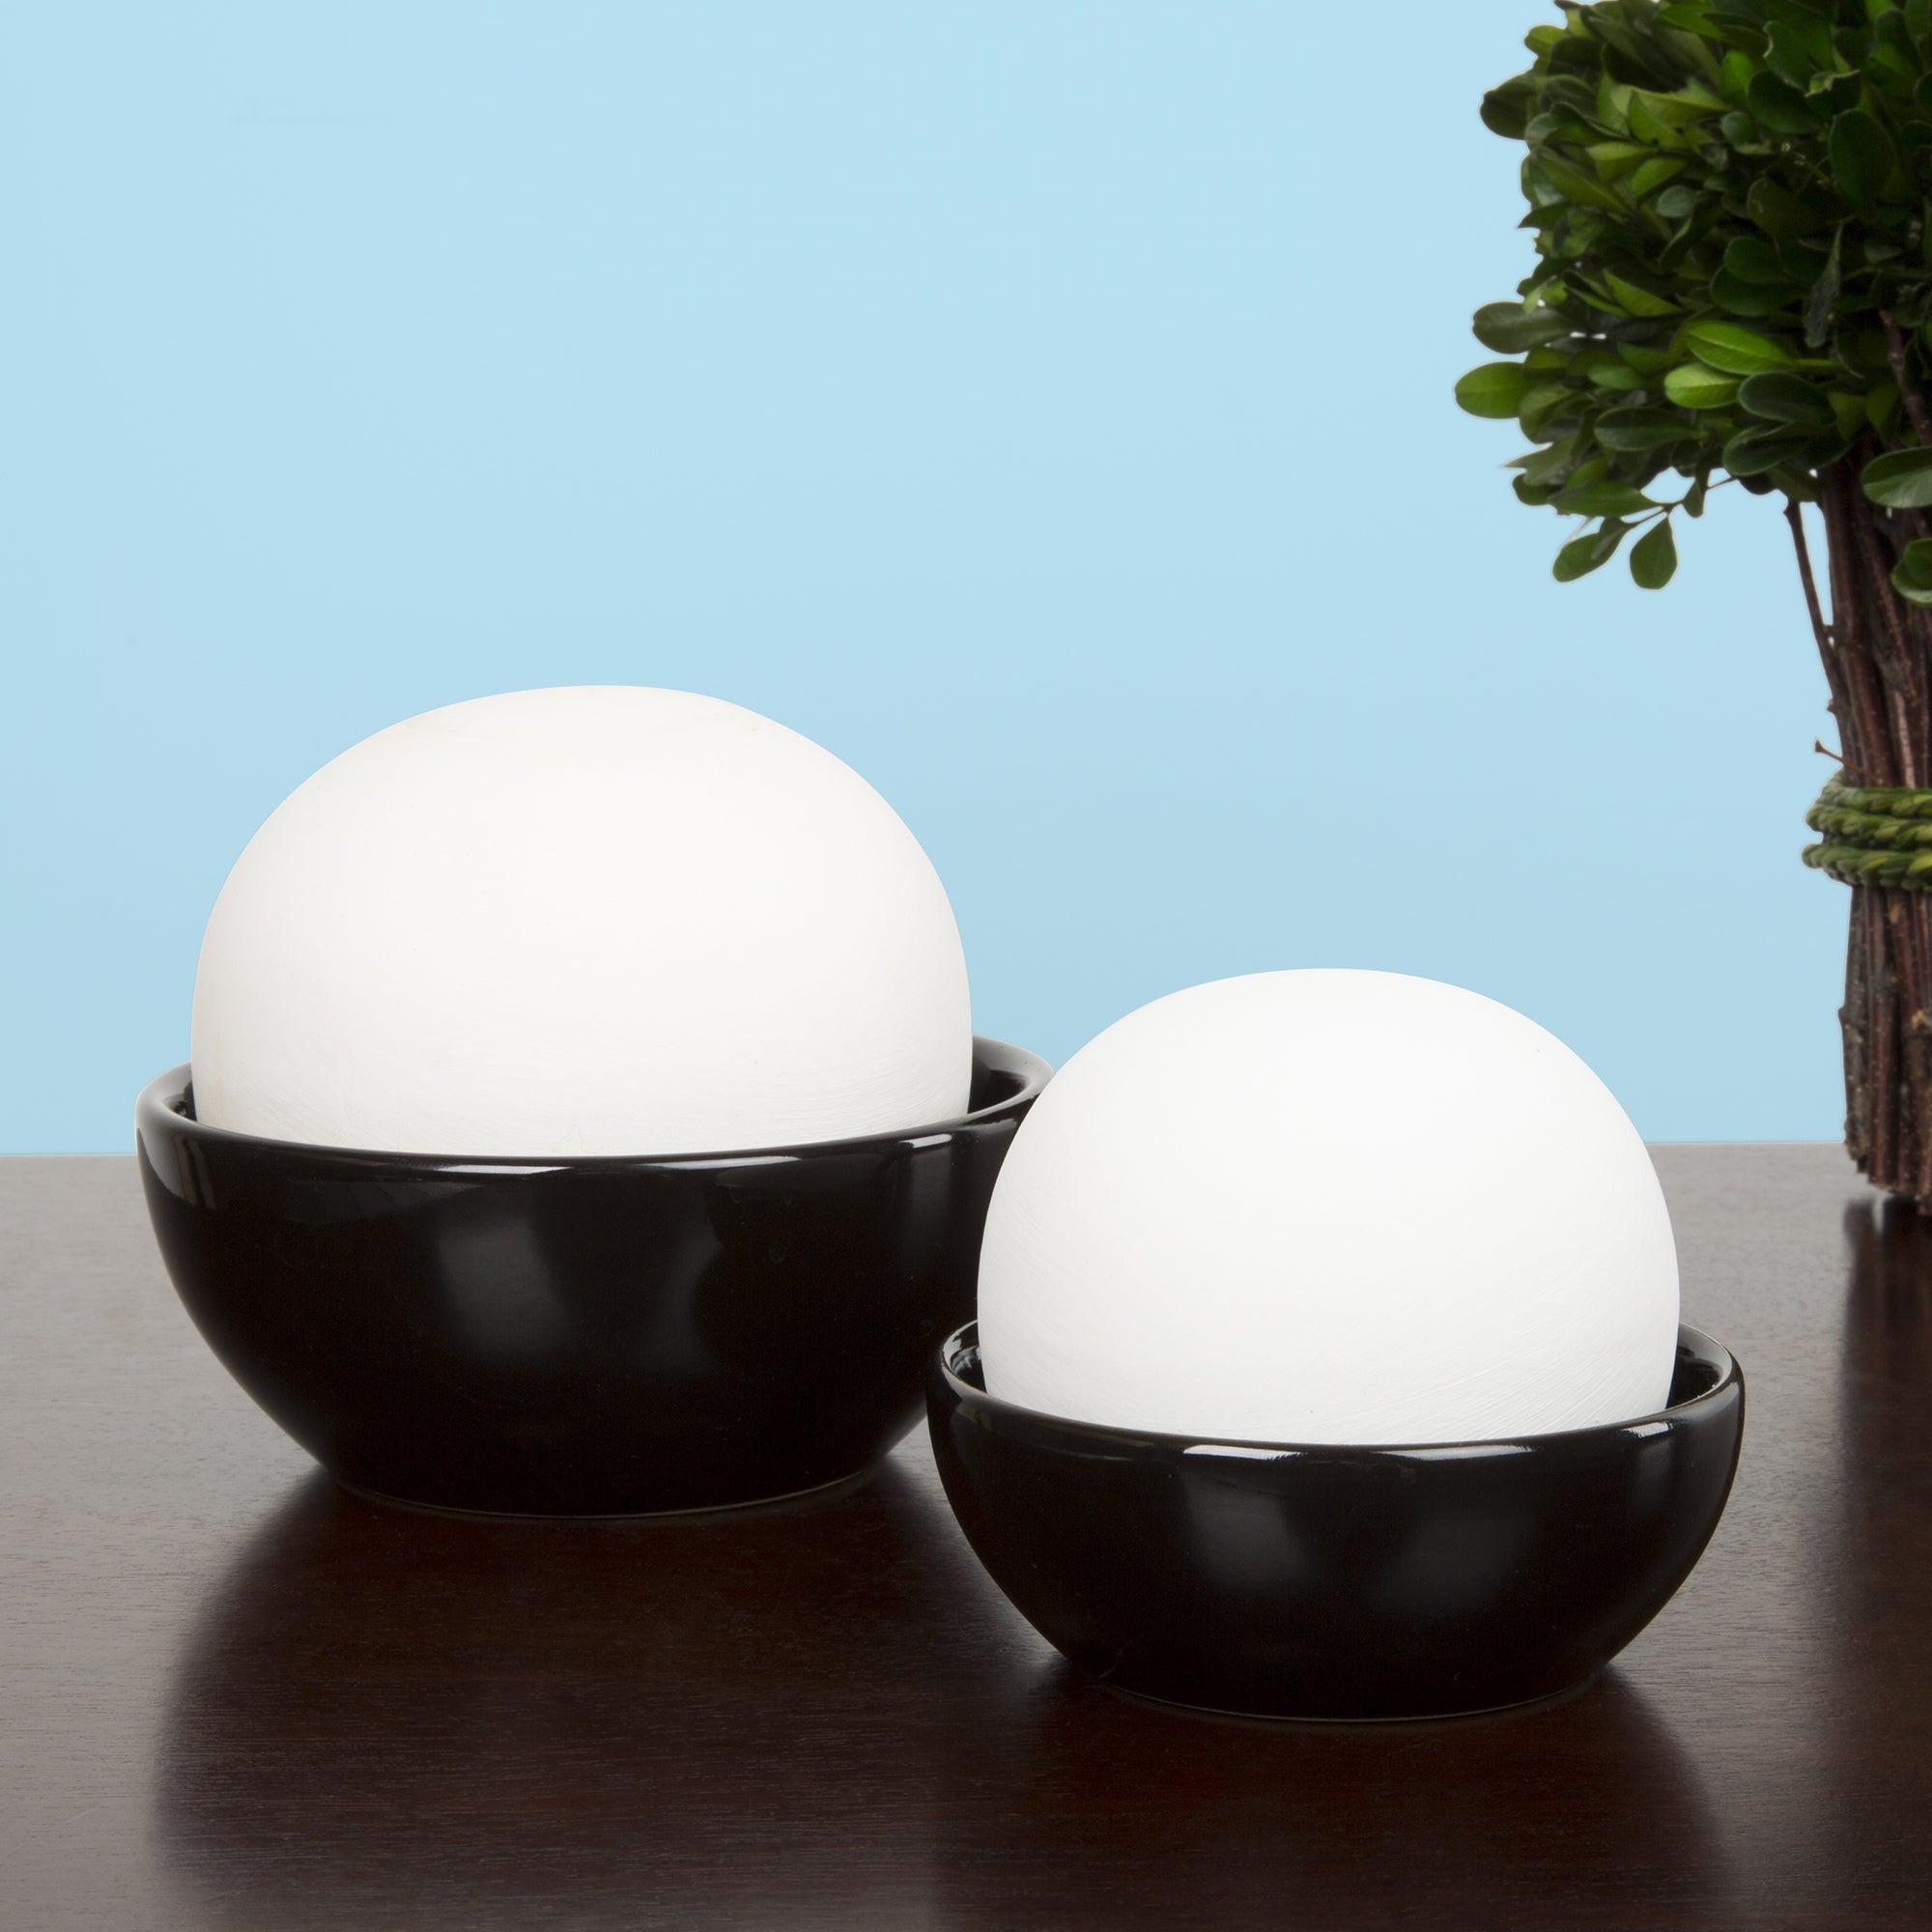 Bluestone Room Humidifiers (Set of 2) (Room Humidifiers -...